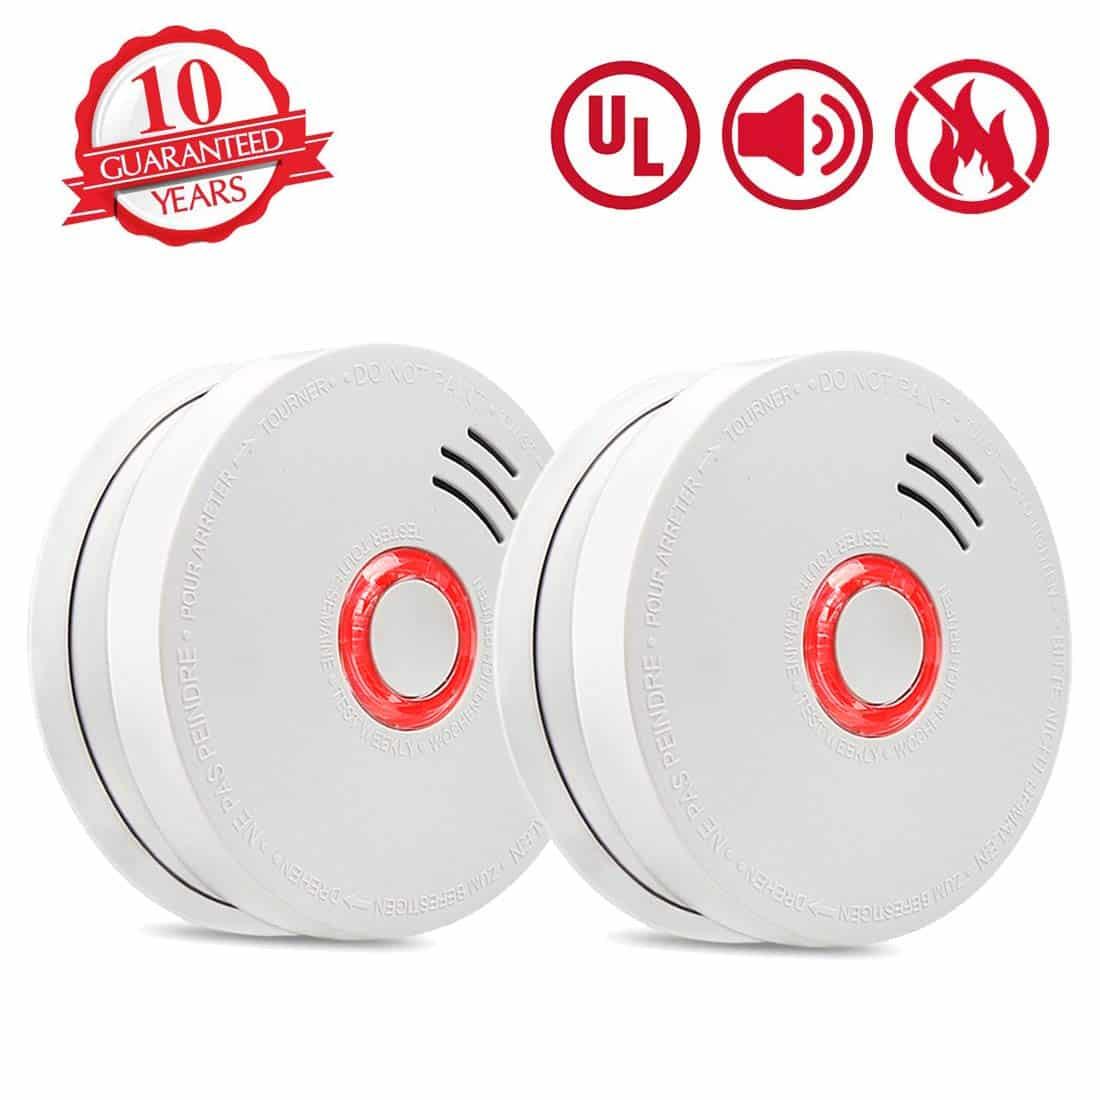 Smoke Detector Fire Alarm, 2 Packs Photoelectric Smoke Detectors